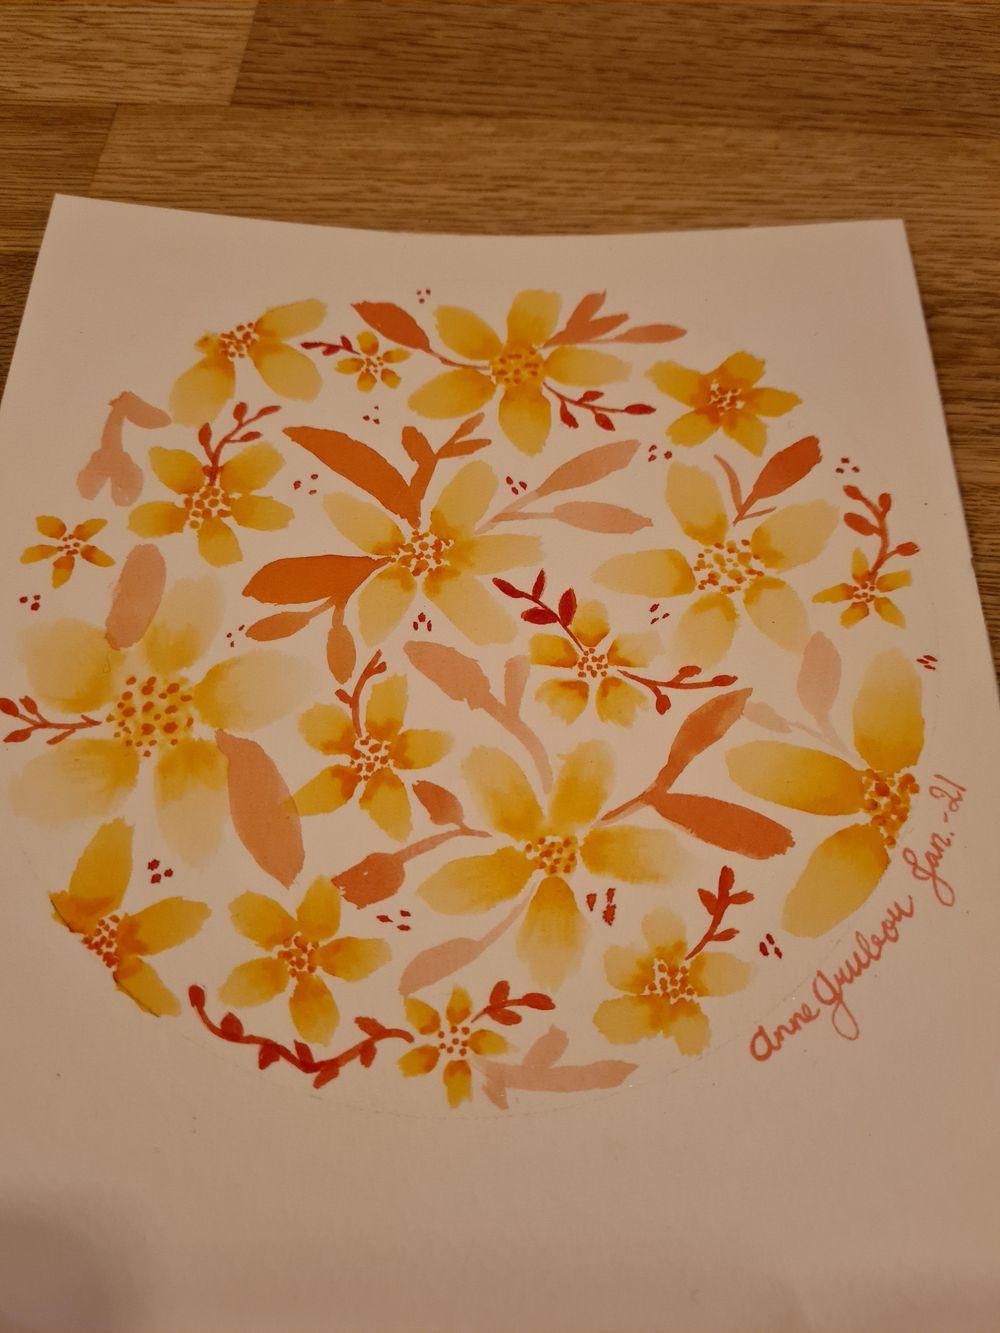 Five petal flower - image 2 - student project